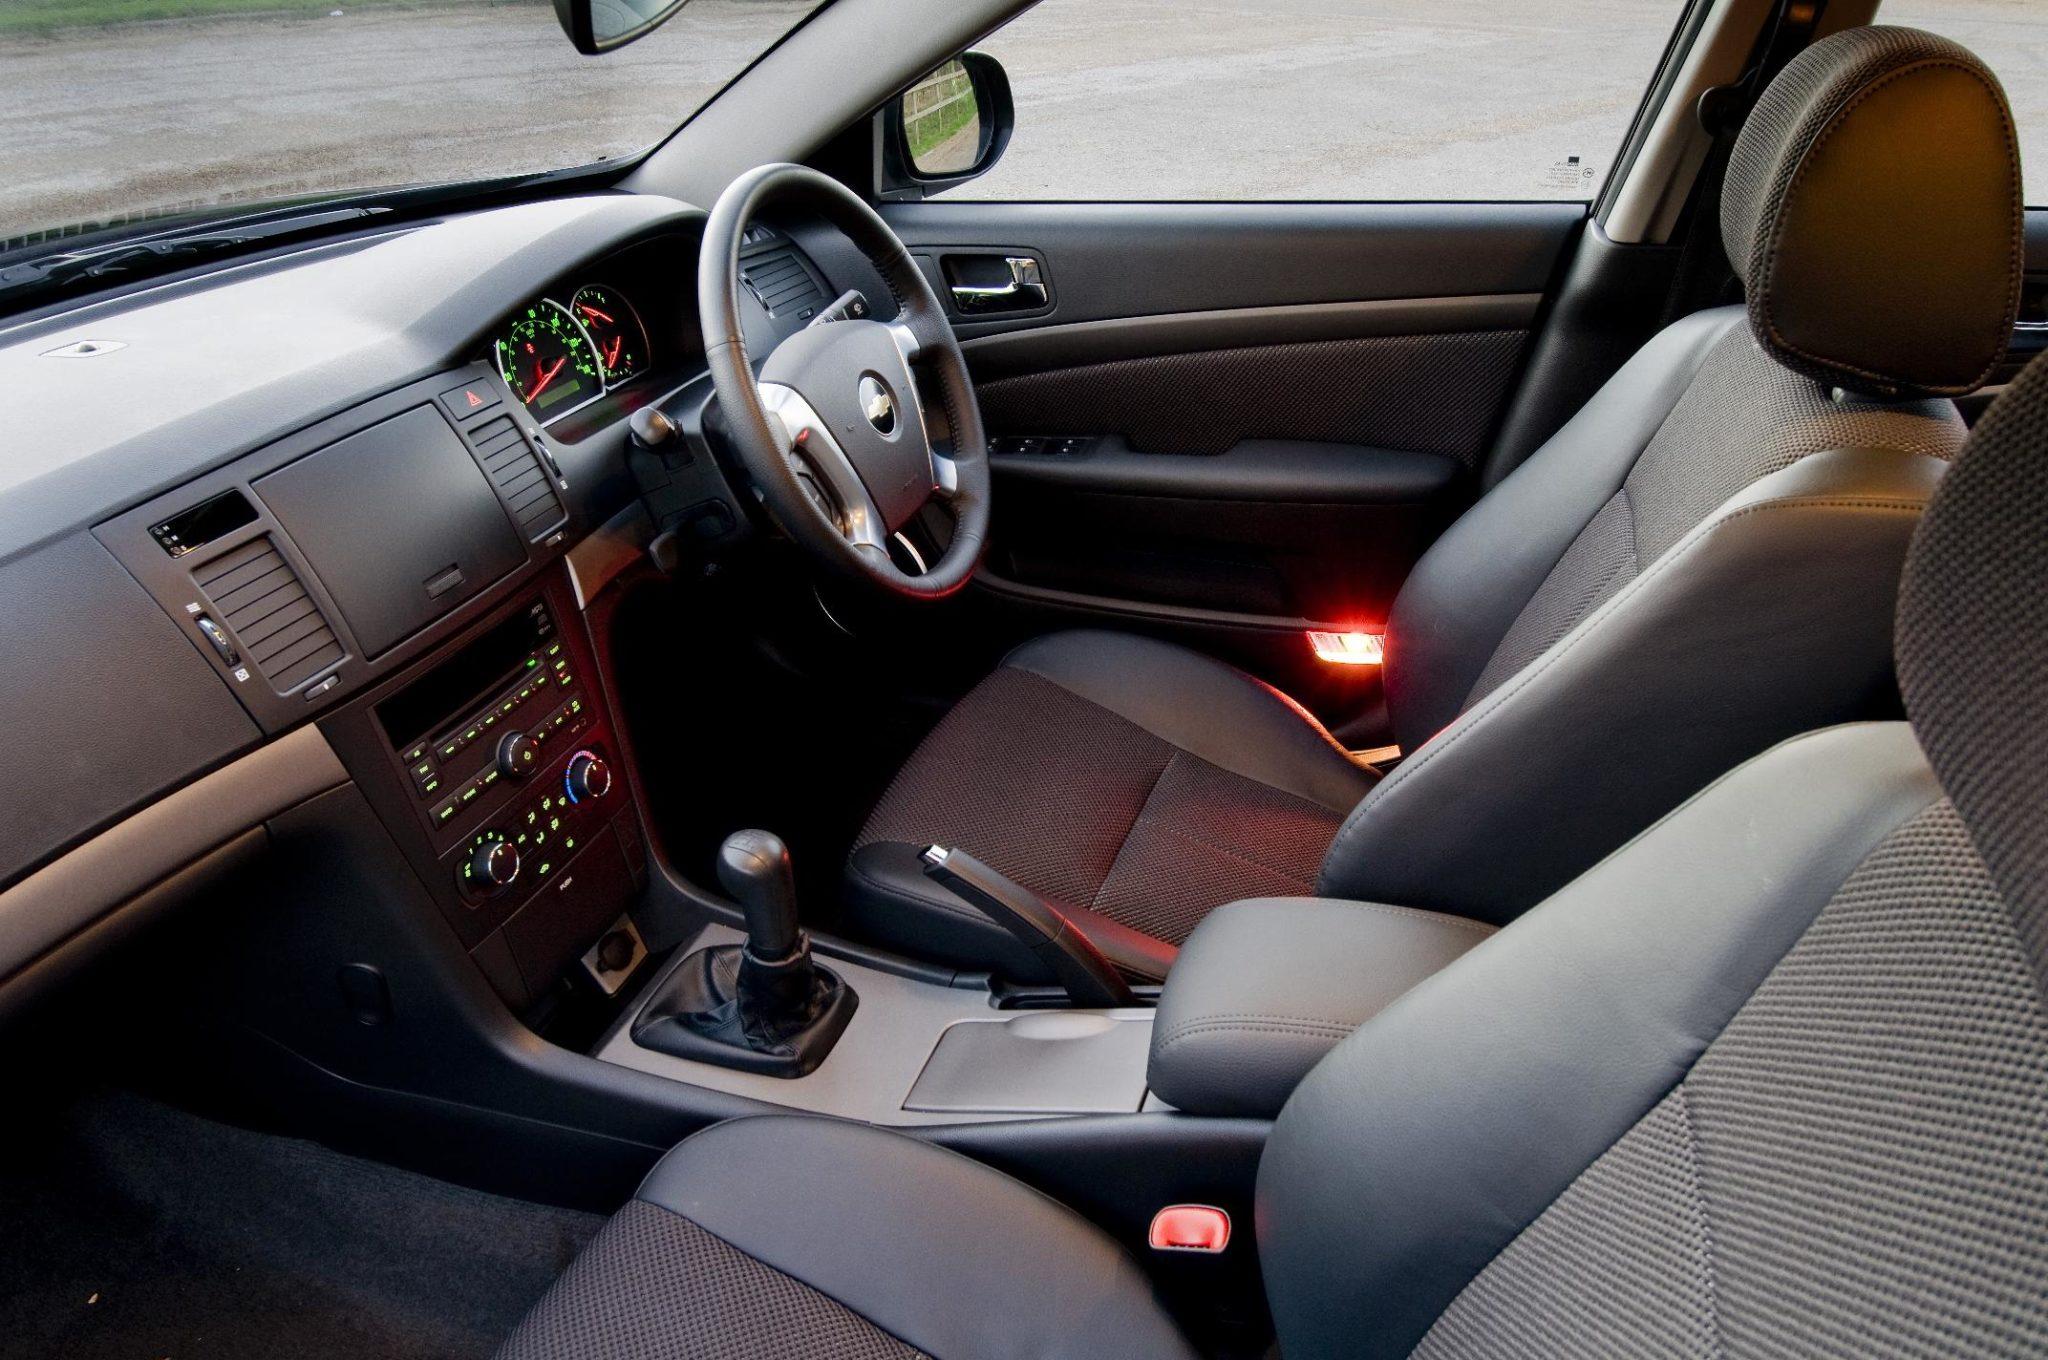 Chevrolet, Epica, Chevrolet Epica, saloon car, cheap car, motoring, automotive, not2grand, Chevrolet Epica Review, Daewoo, bargain car, featured